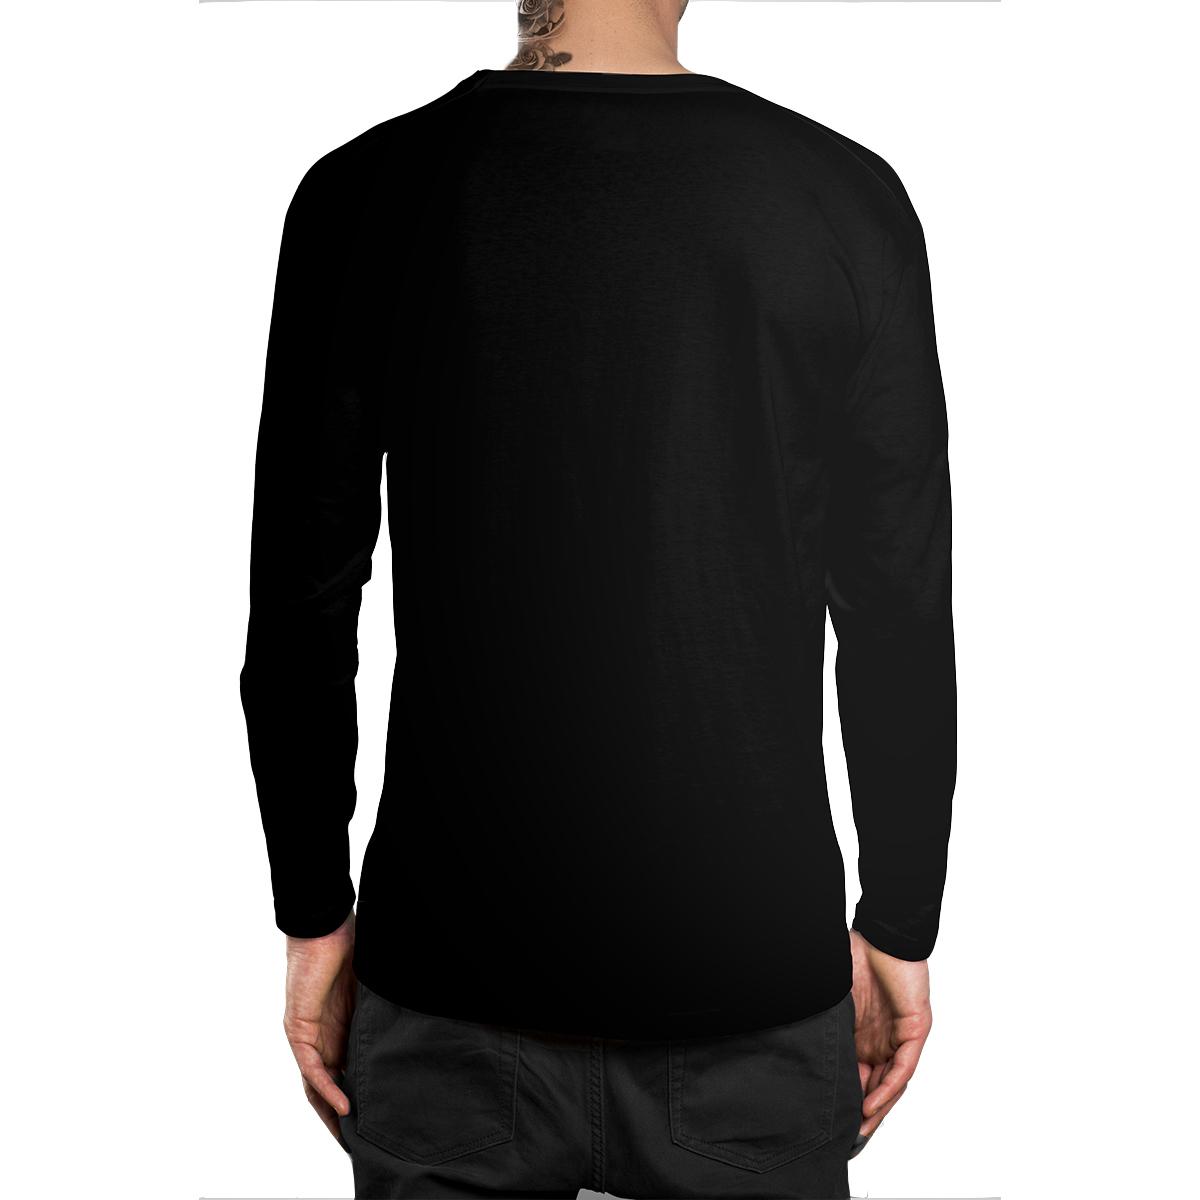 Stompy Camiseta Manga Longa Modelo 22